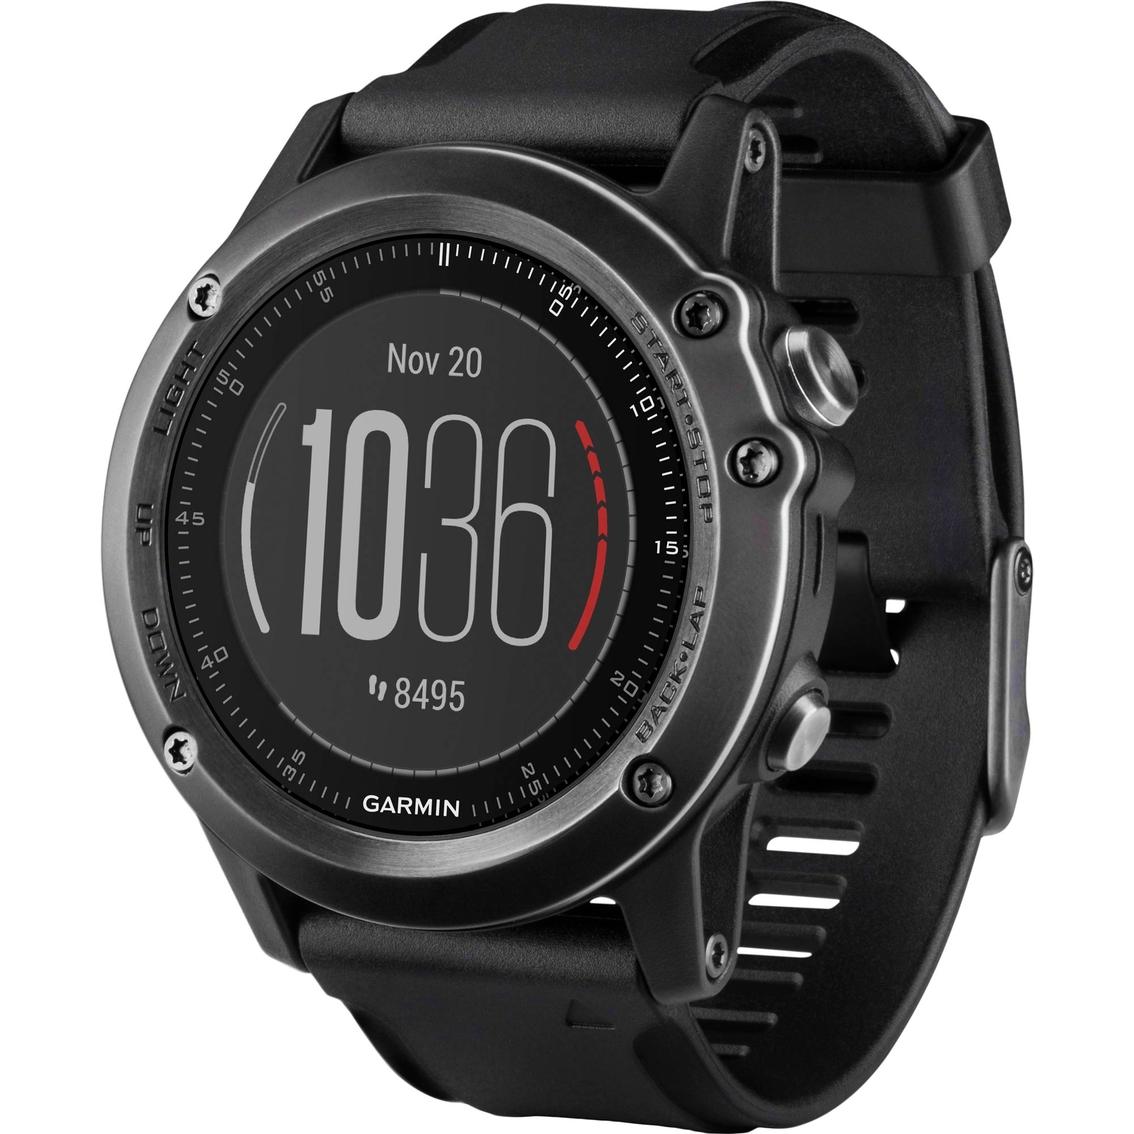 Garmin Fenix 3 Hr Gps Sports Watch Activity Trackers Pedometers